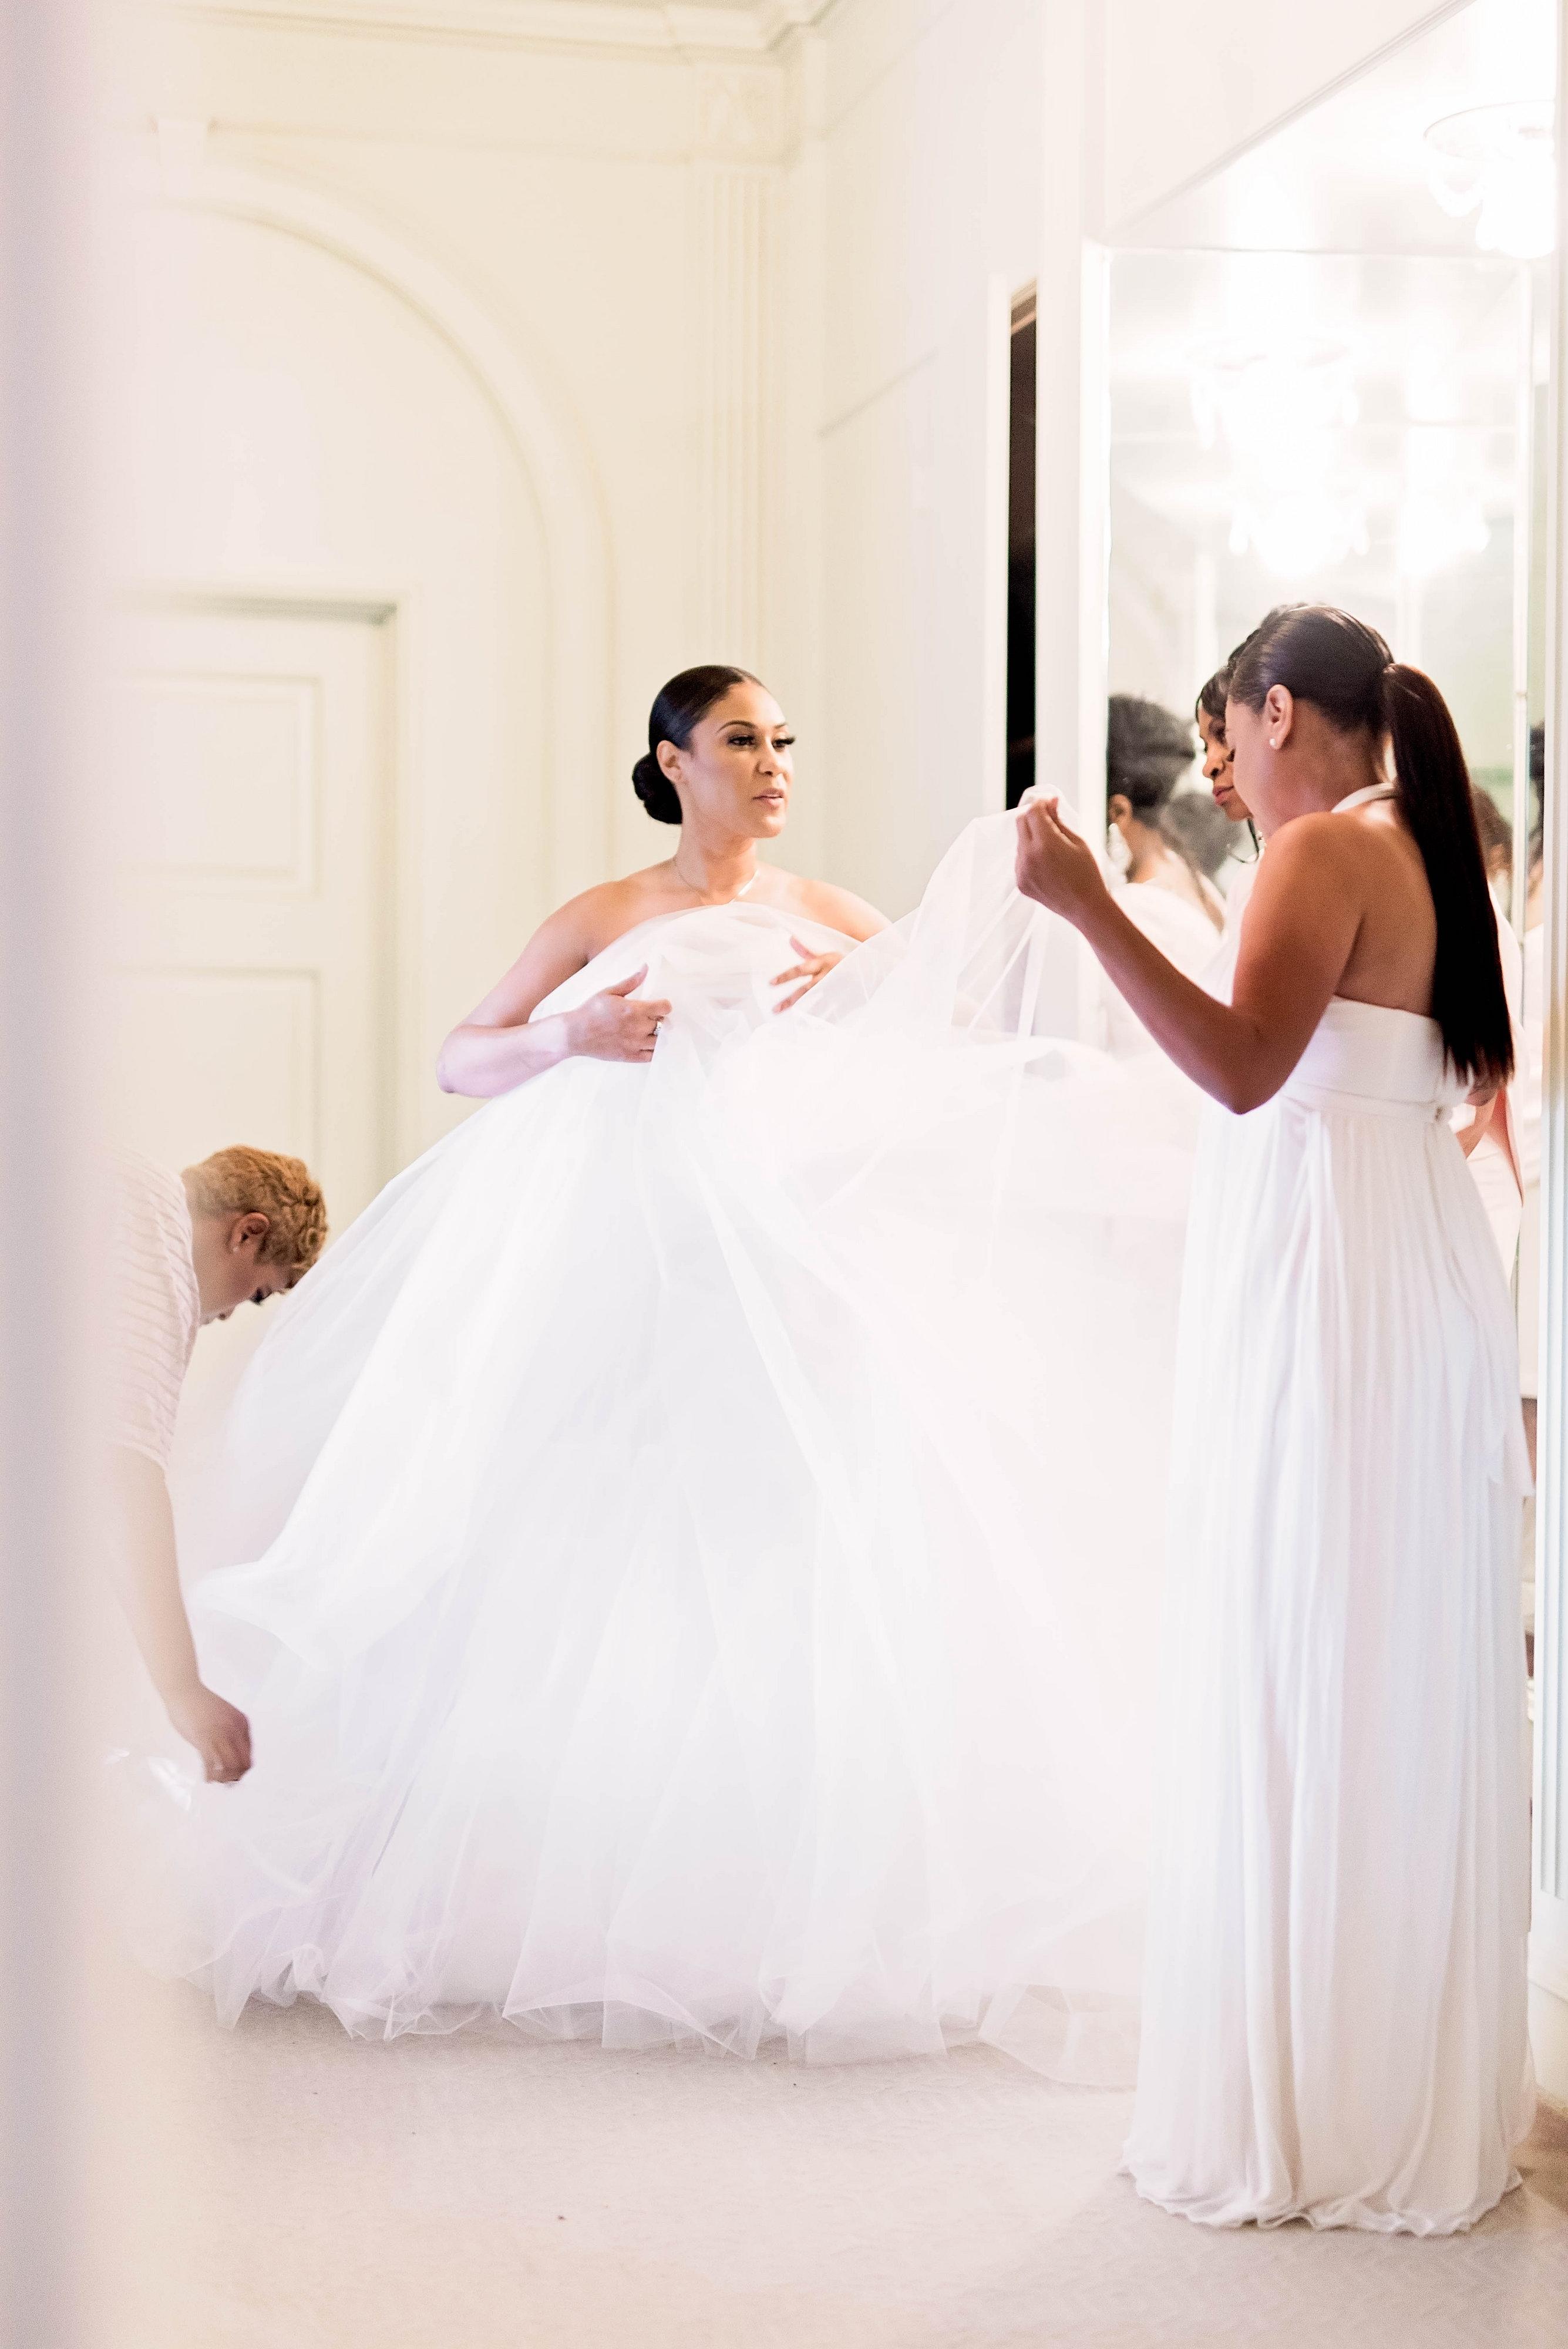 bride getting ready in ballgown dress